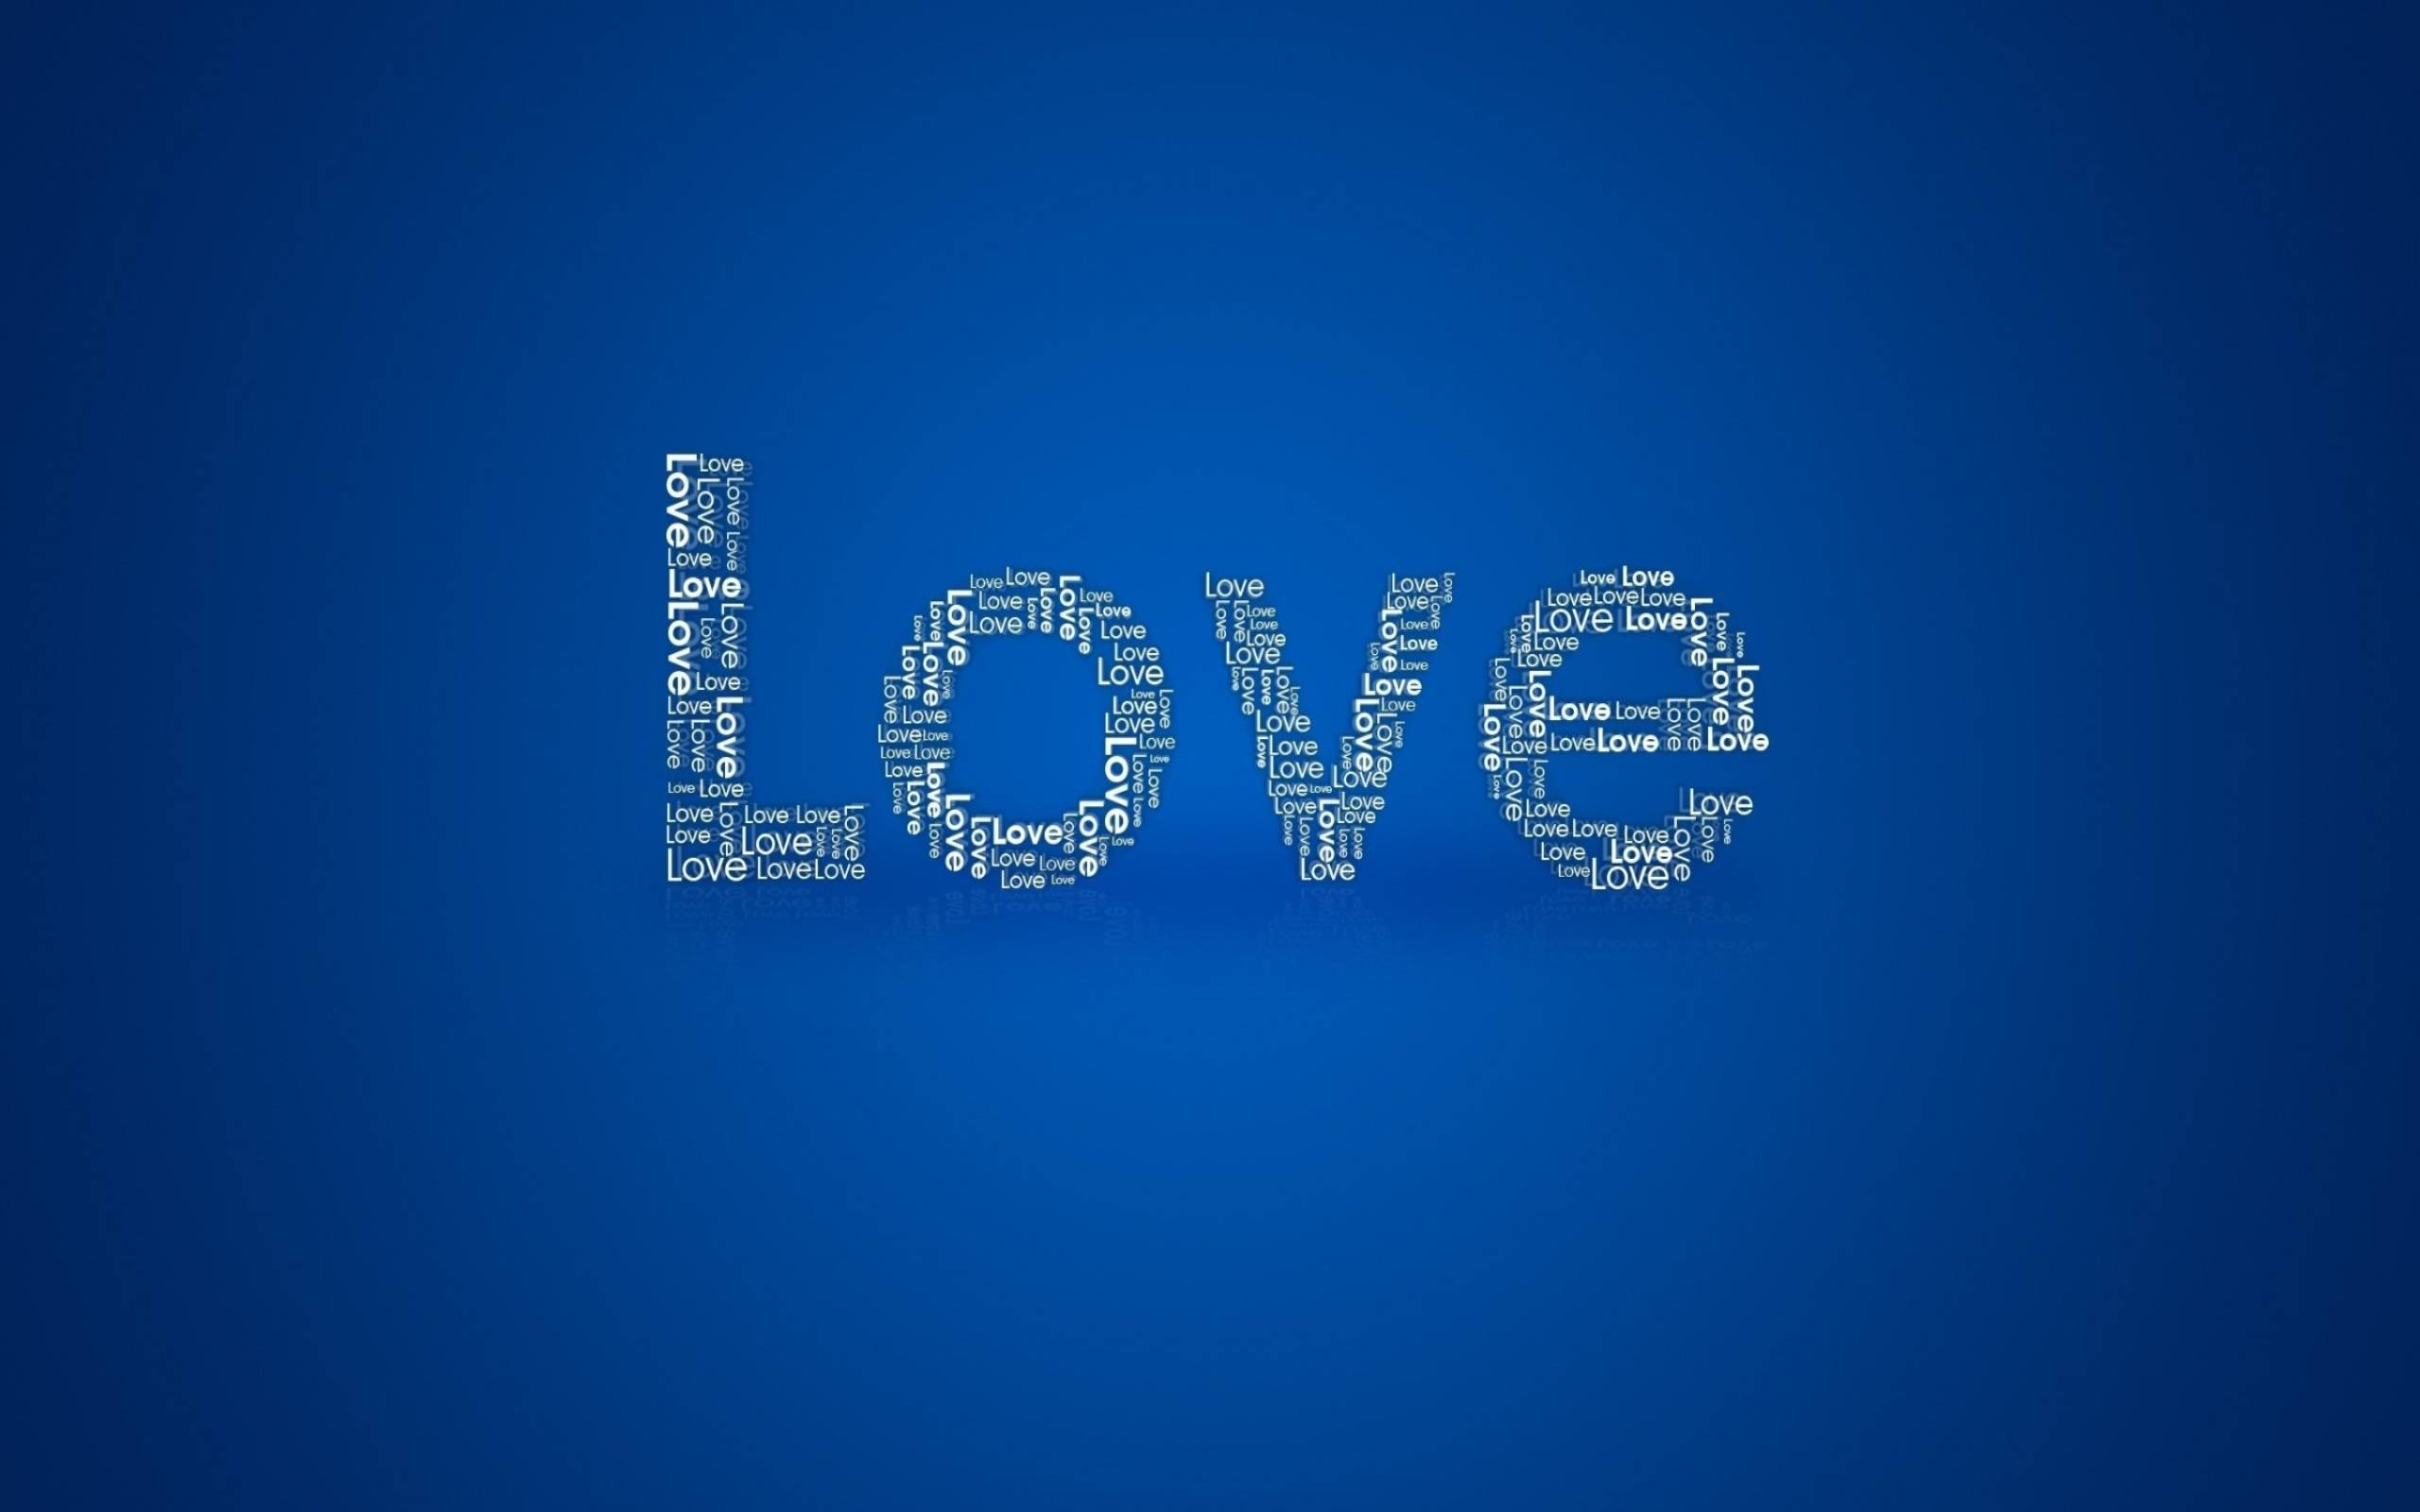 обои love, надпись, на синем фоне картинки фото